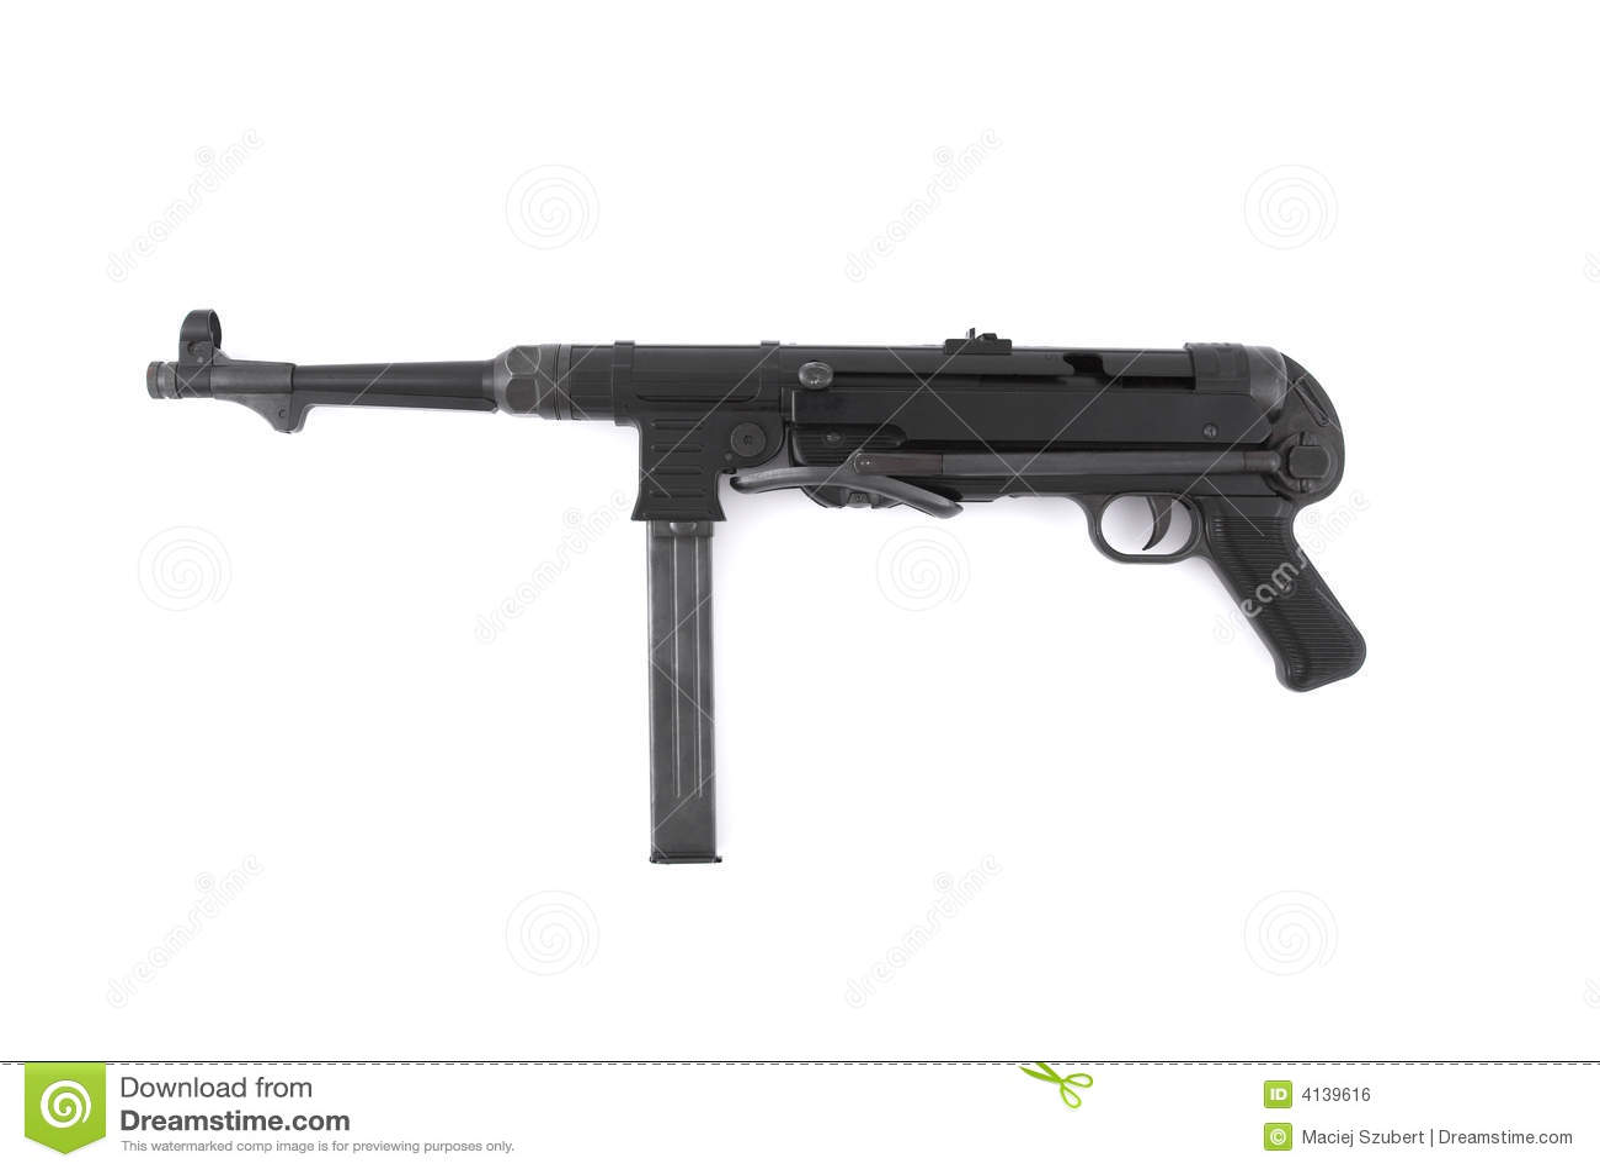 German Ww2 Machine Guns MP40 German submachine gun